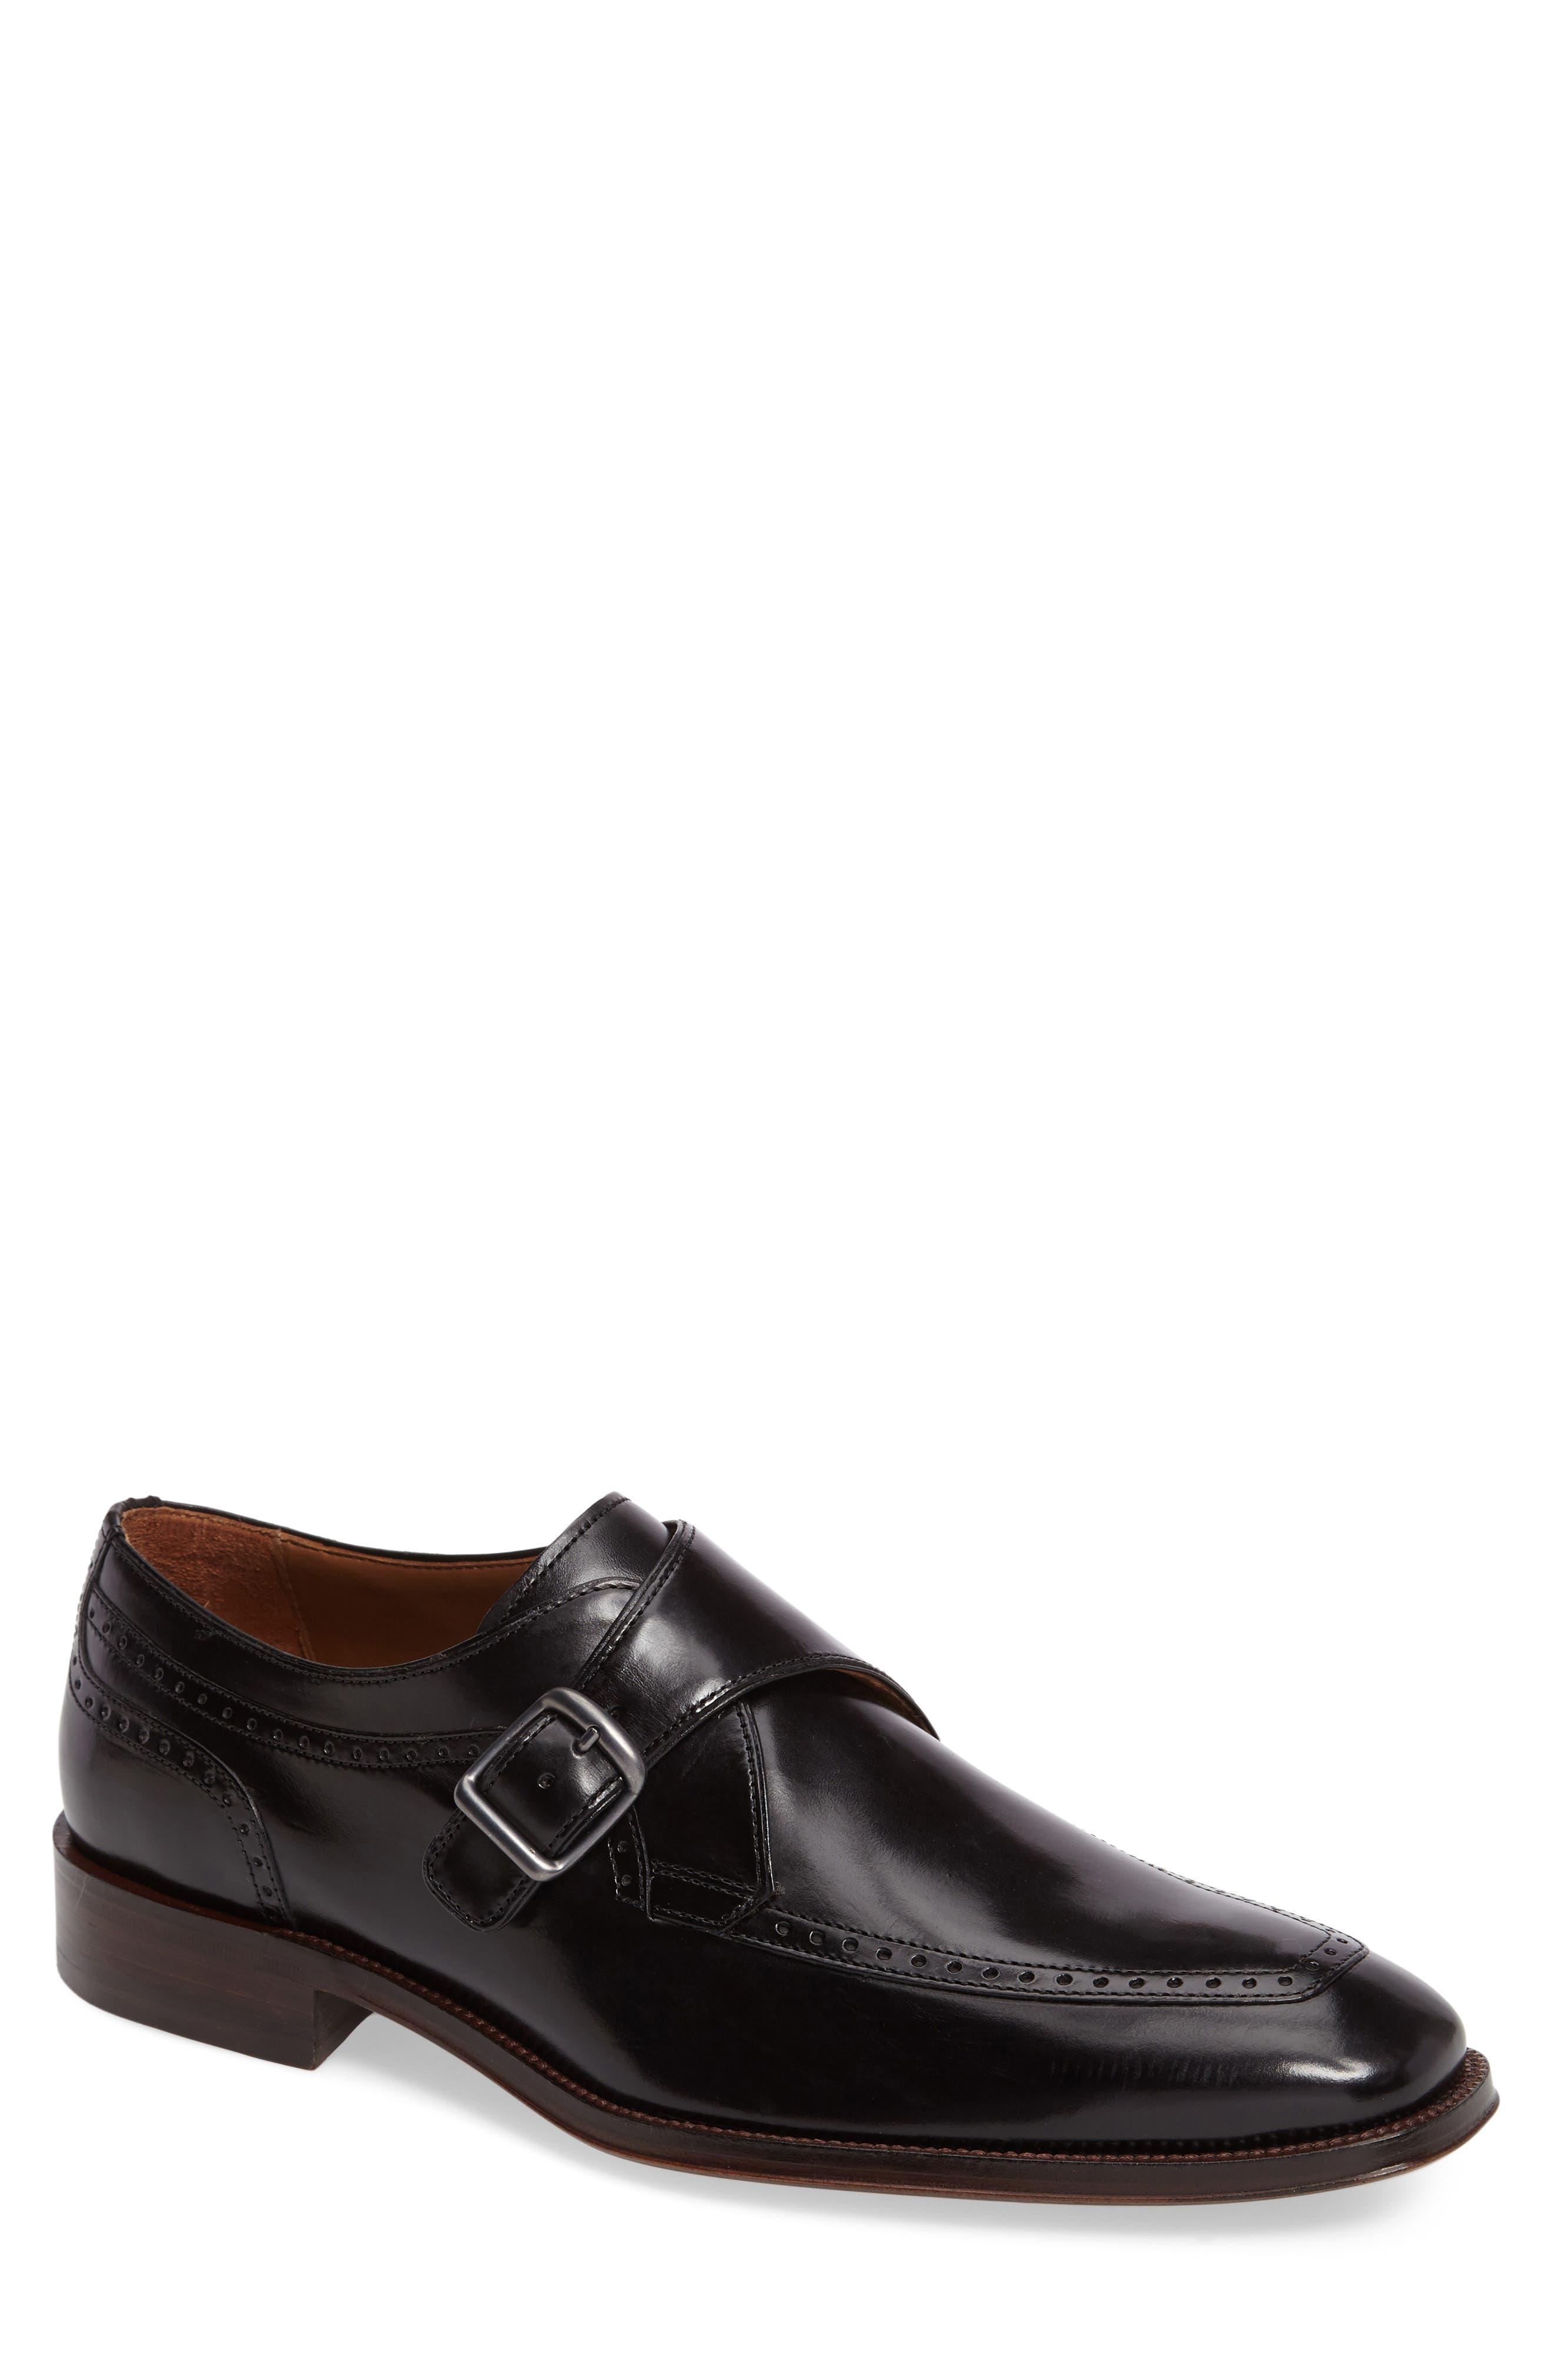 Alternate Image 1 Selected - Johnston & Murphy Boydstun Monk Strap Shoe (Men)